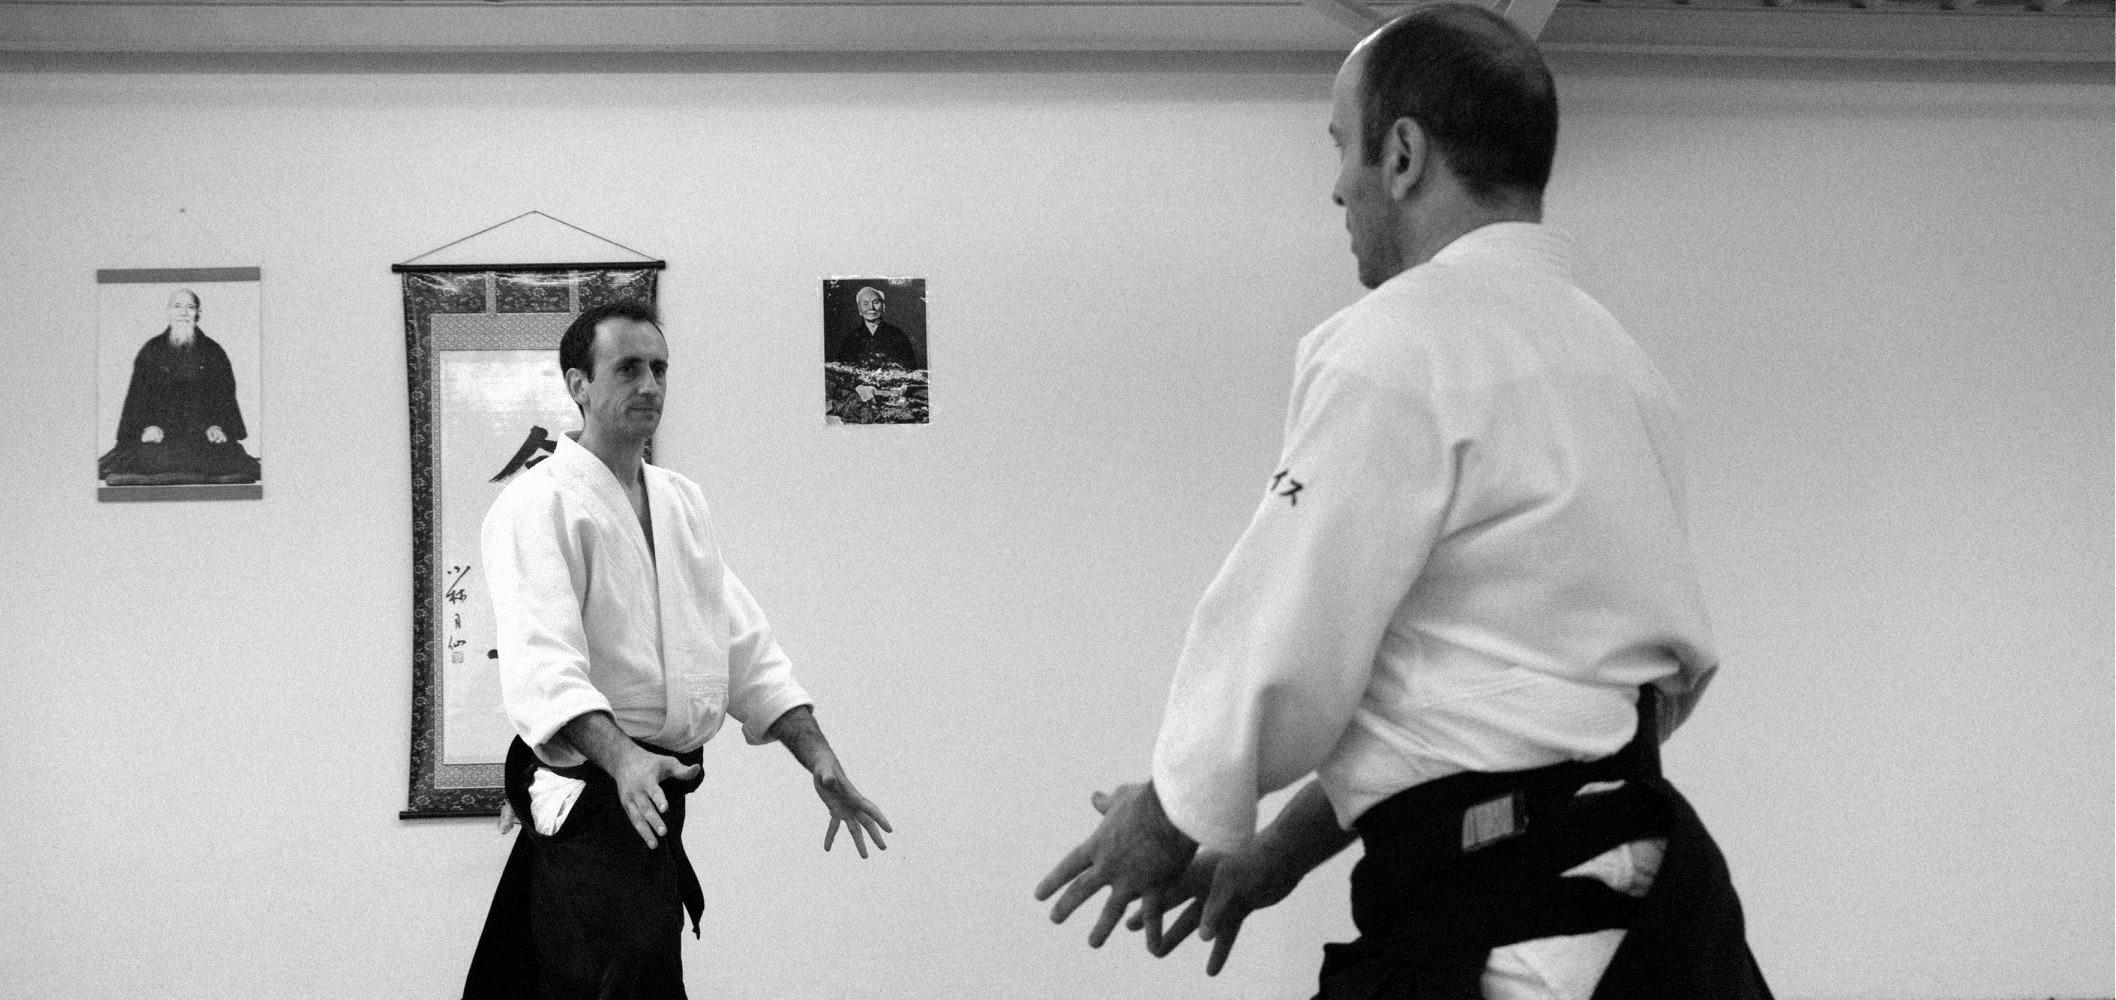 Seminario de Aikido - Fabrice Croizé - Mir/Ar